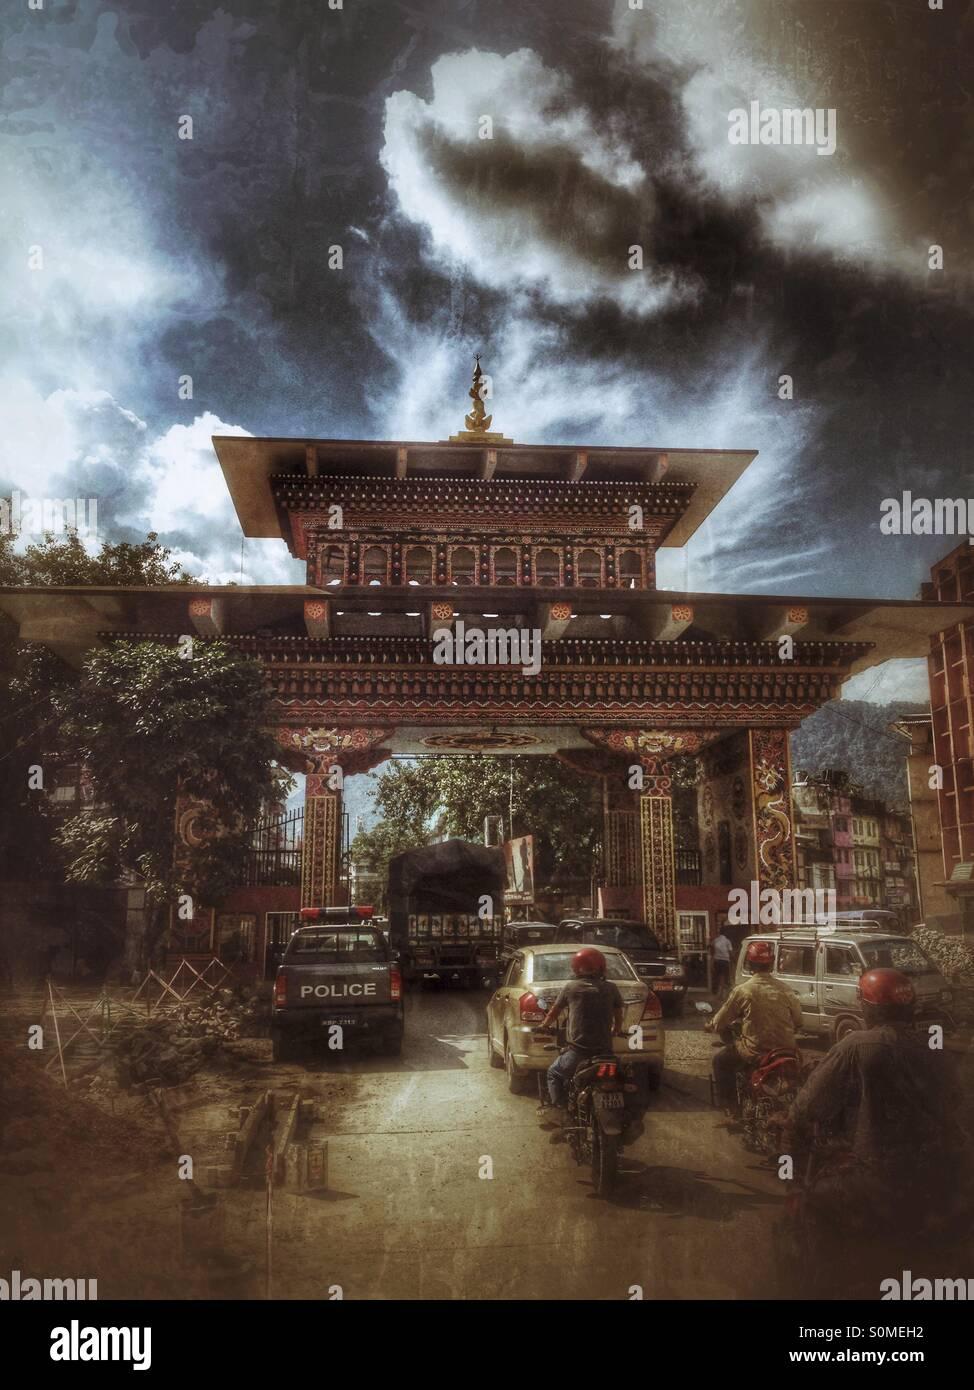 Gateway border between Bhutan and India. Phuentsholing, Bhutan, Asia. - Stock Image